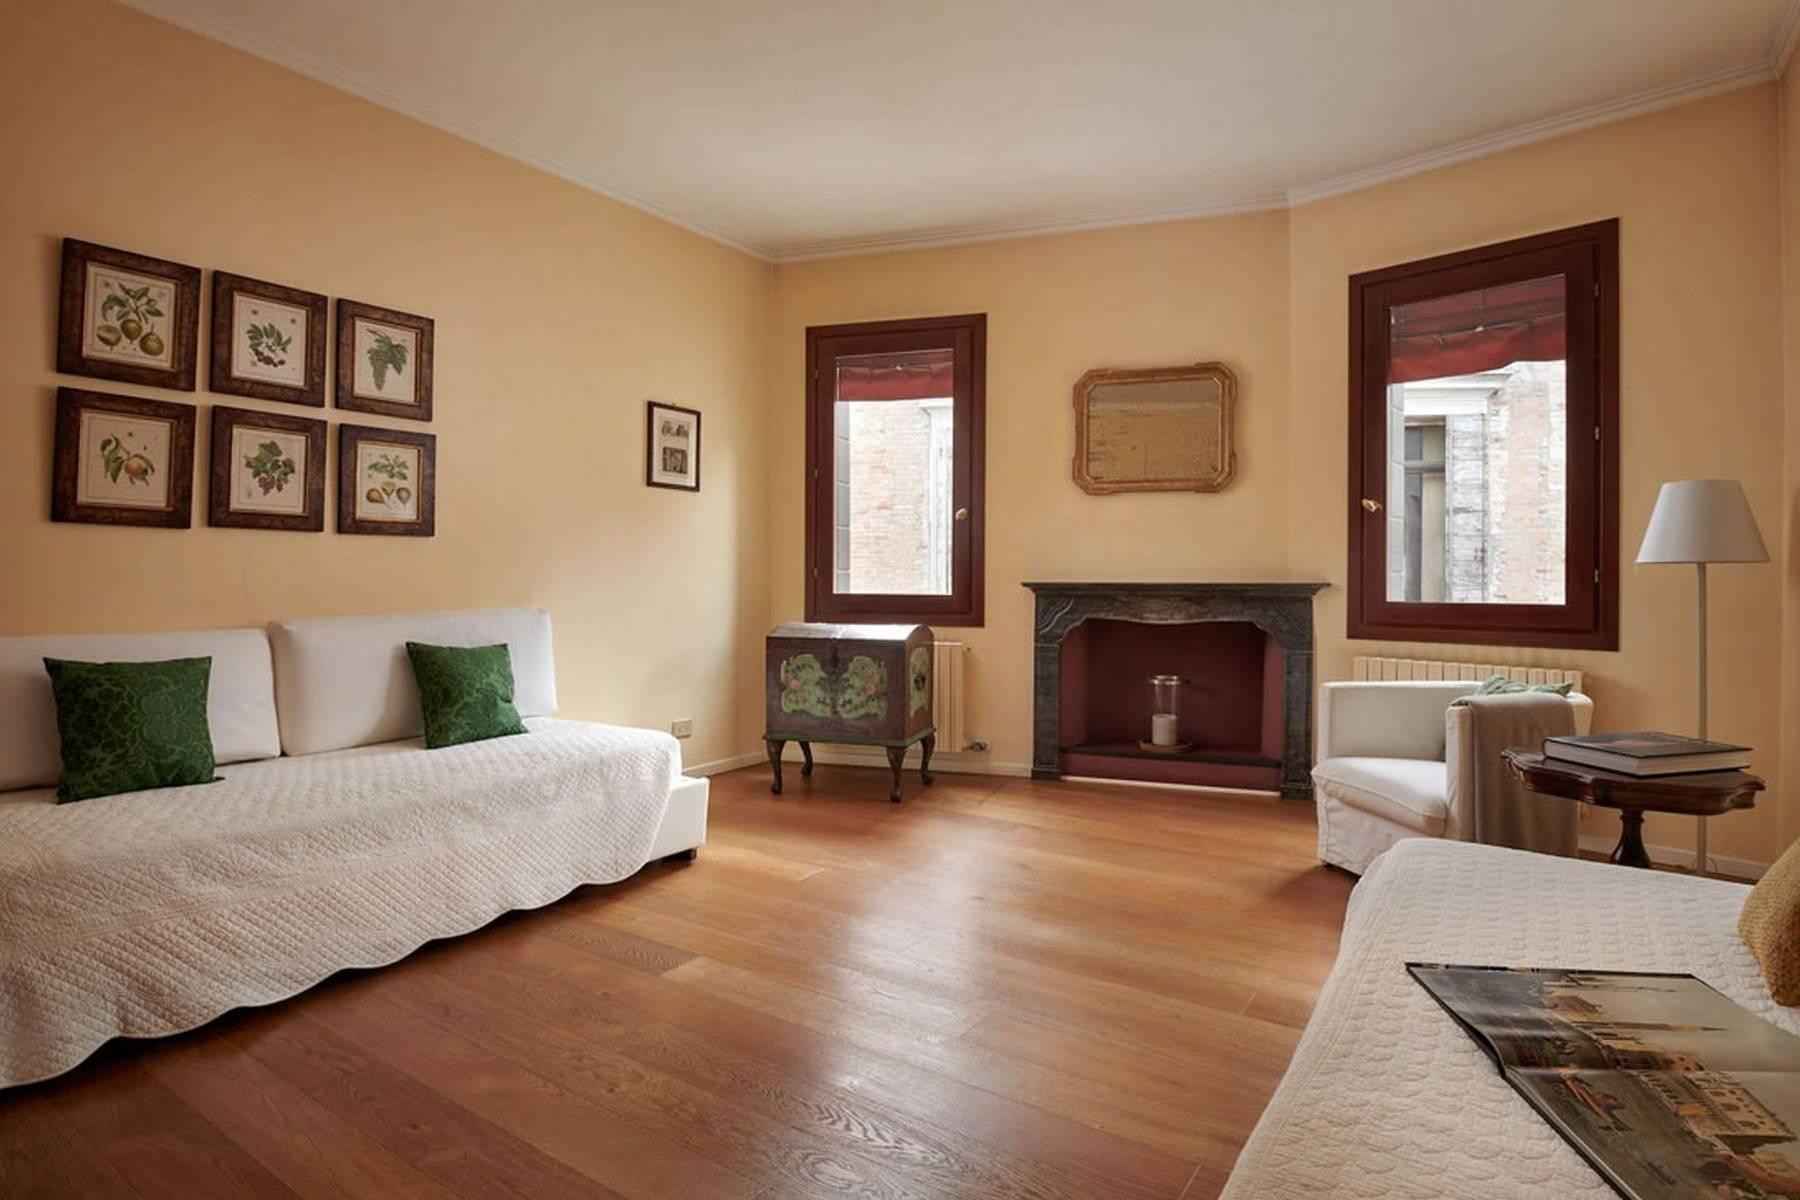 Appartement de design dans le Palazzo Querini Stampalia / S.M. Formosa - 23